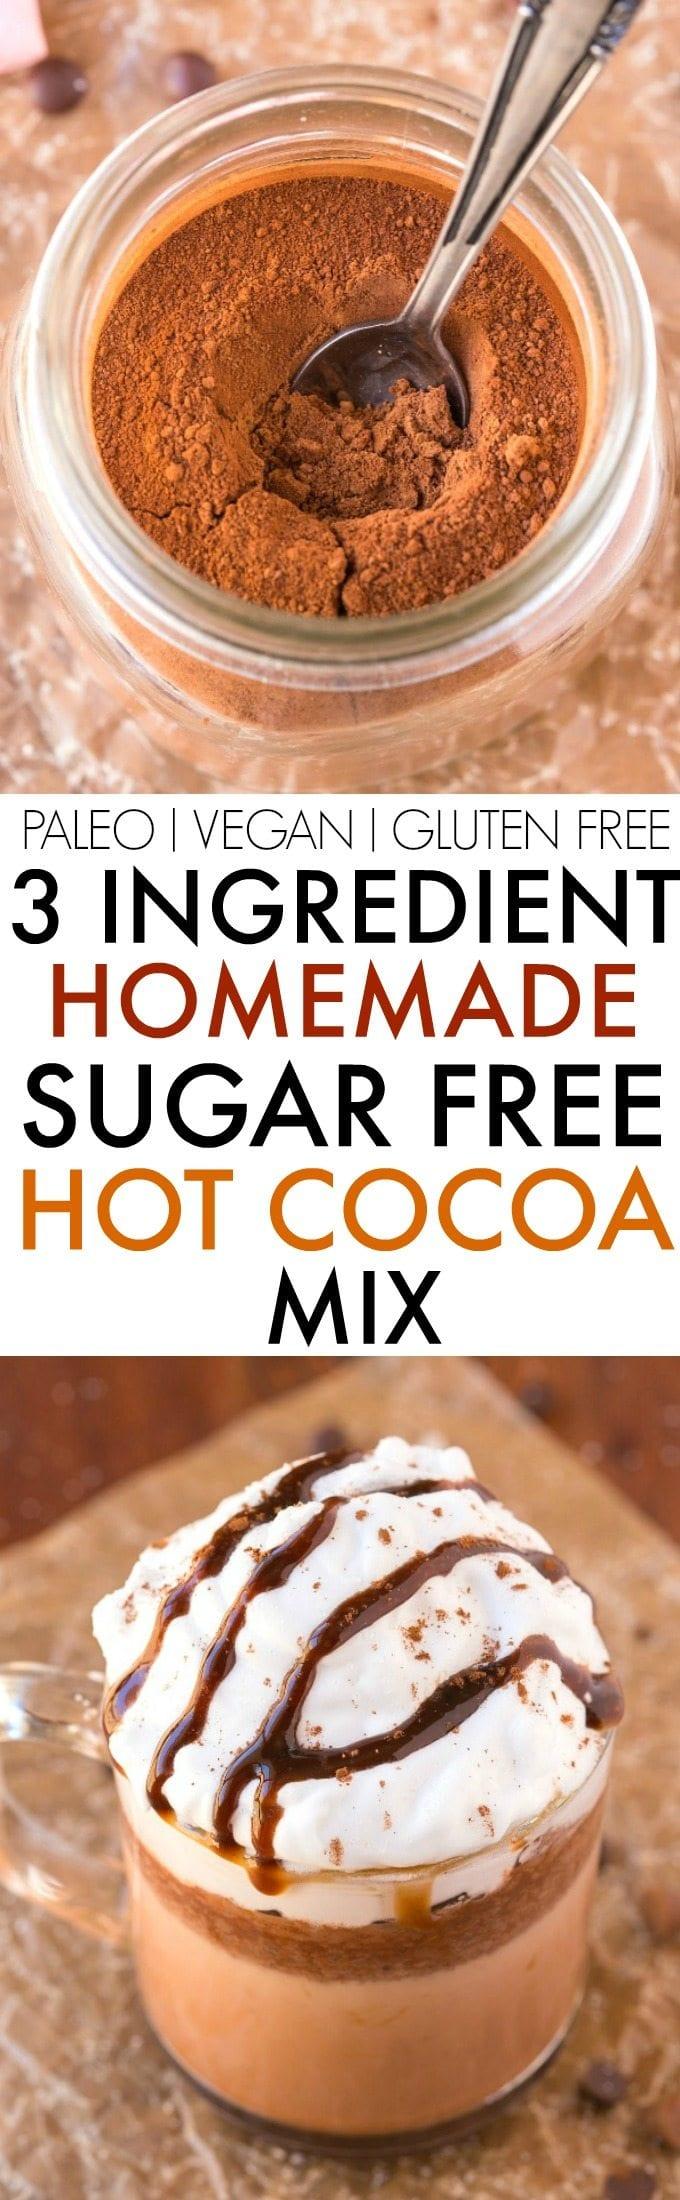 Healthy Homemade Sugar Free Hot Chocolate Mix